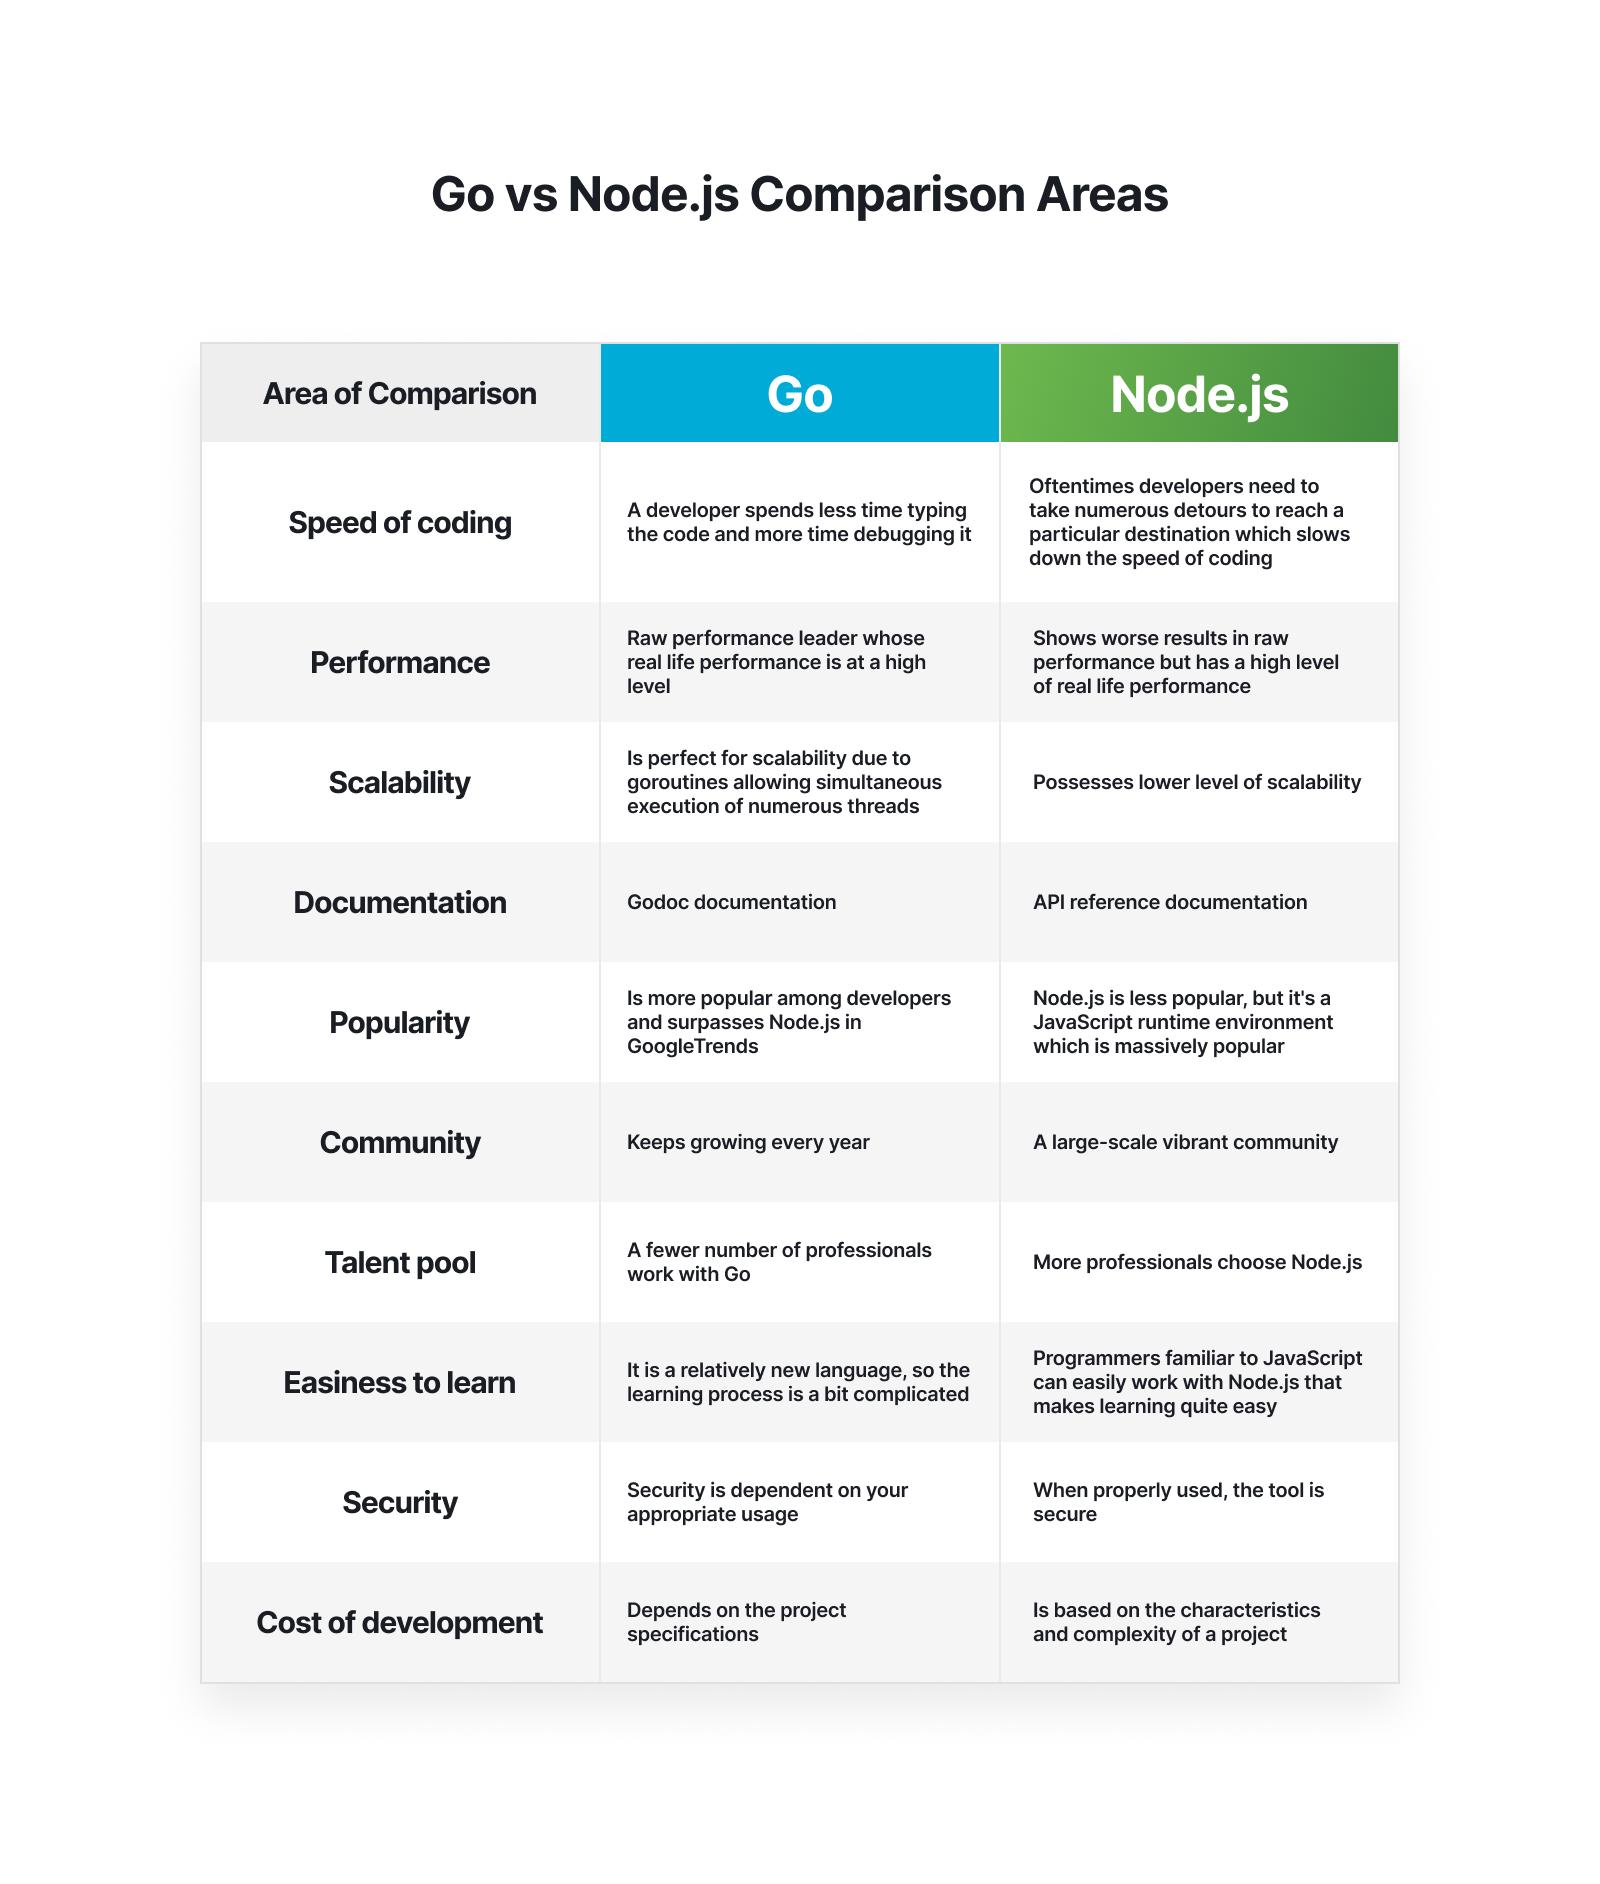 go vs nodejs comparison areas